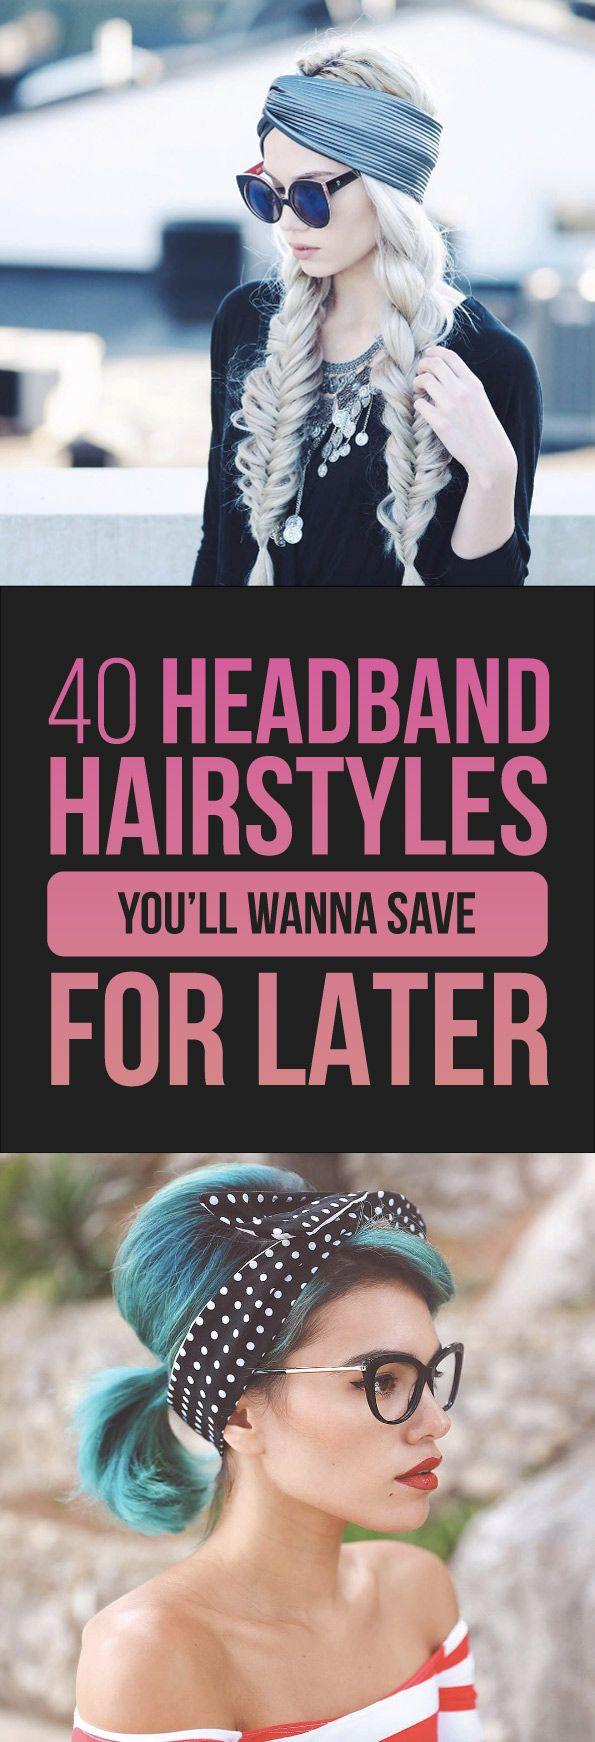 Tousledbob. (Alanna Durkovich) Big bow headband. (Brittany Sullivan) Hidden headband. (Missy Sue) Afro textured hair. (Olaj Arel) Side knotted braid. (Ashley McMullen) Messy summer bun. (Emma Chen) Face framing curls. (Alanna Durkovich) High ponytail with thin headband. (Ashley McMullen) Lace headband. (Headbands of Hope) Rolled-up. (Emily Meyers)